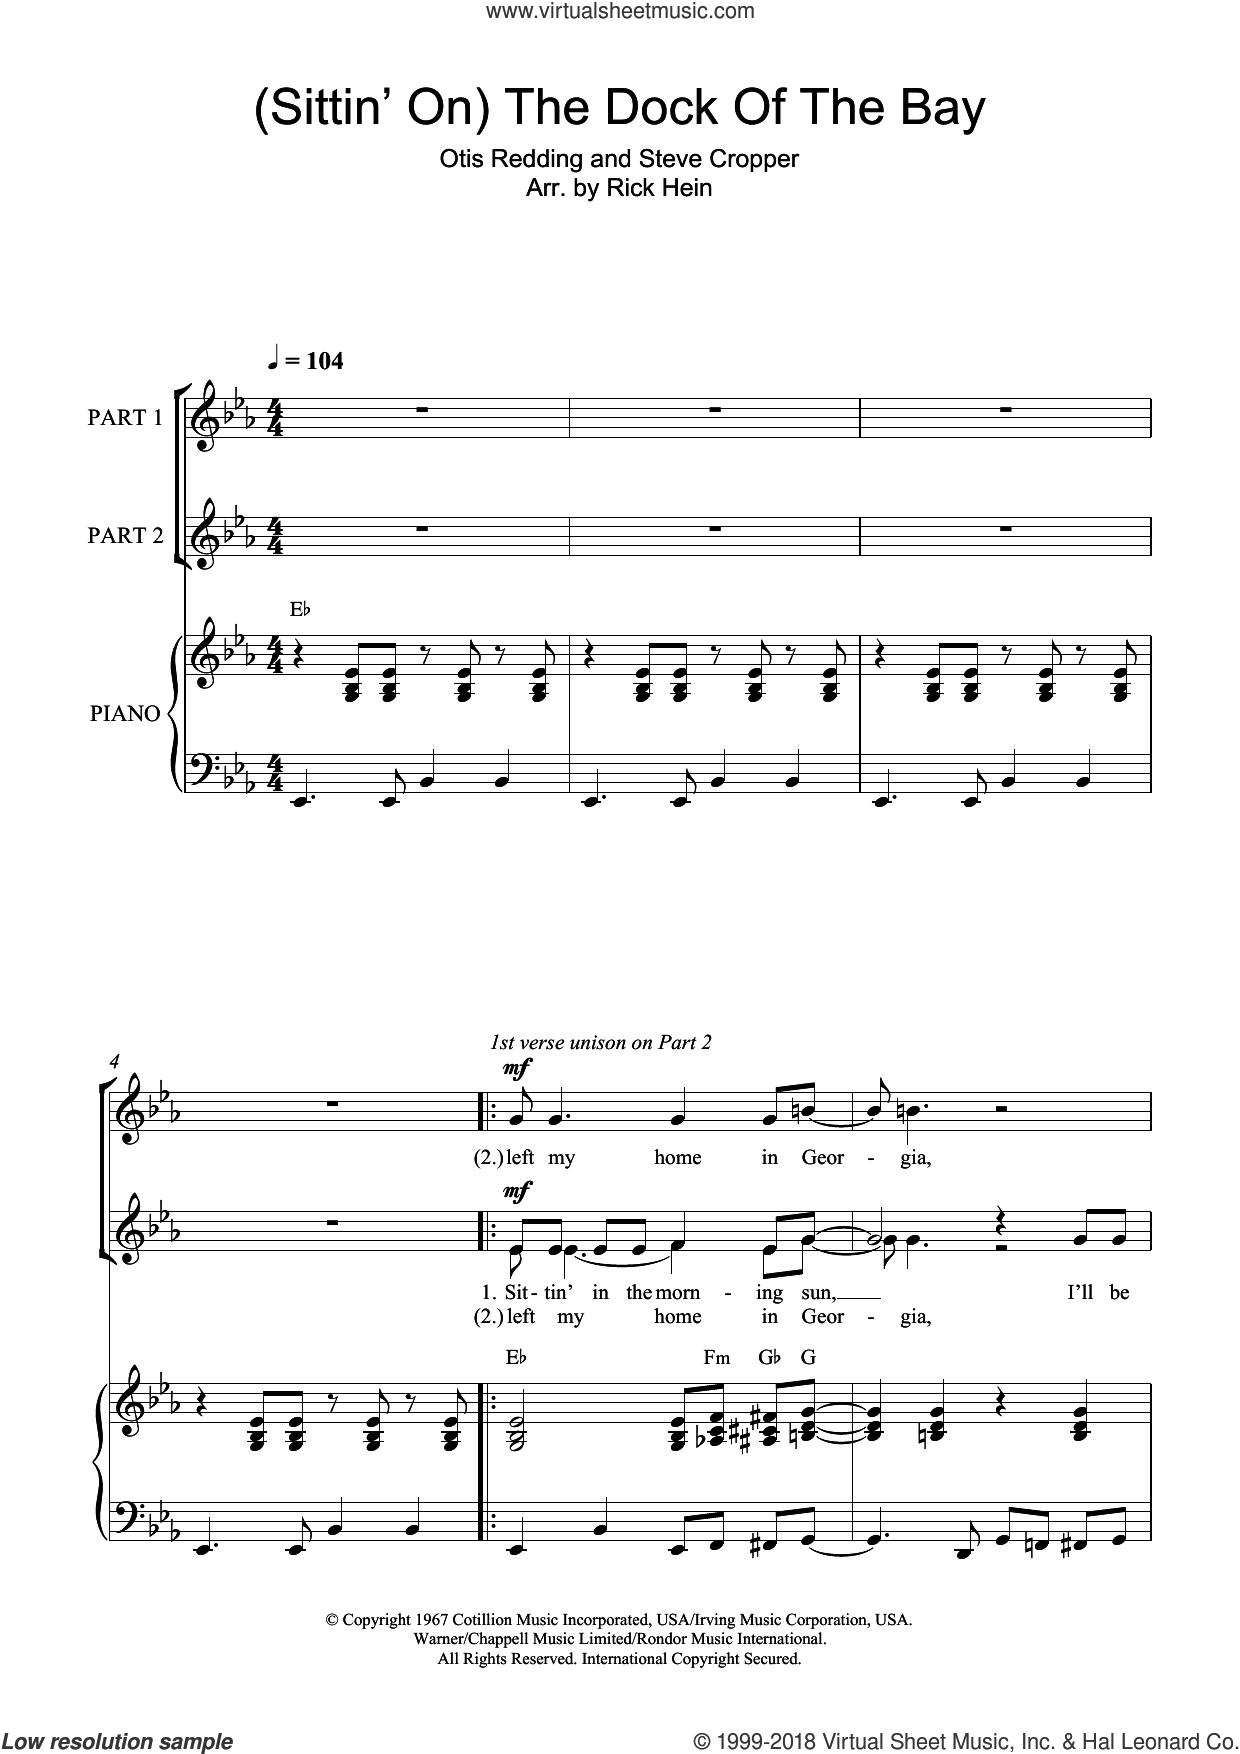 (Sittin' On) The Dock Of The Bay sheet music for choir by Otis Redding, Rick Hein and Steve Cropper, intermediate skill level